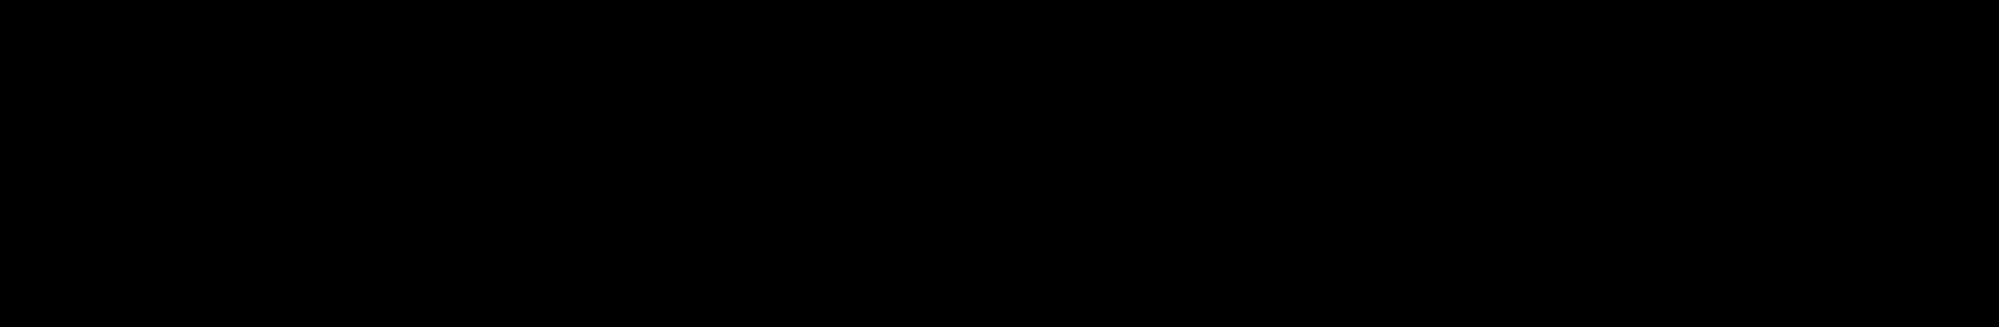 image49.png